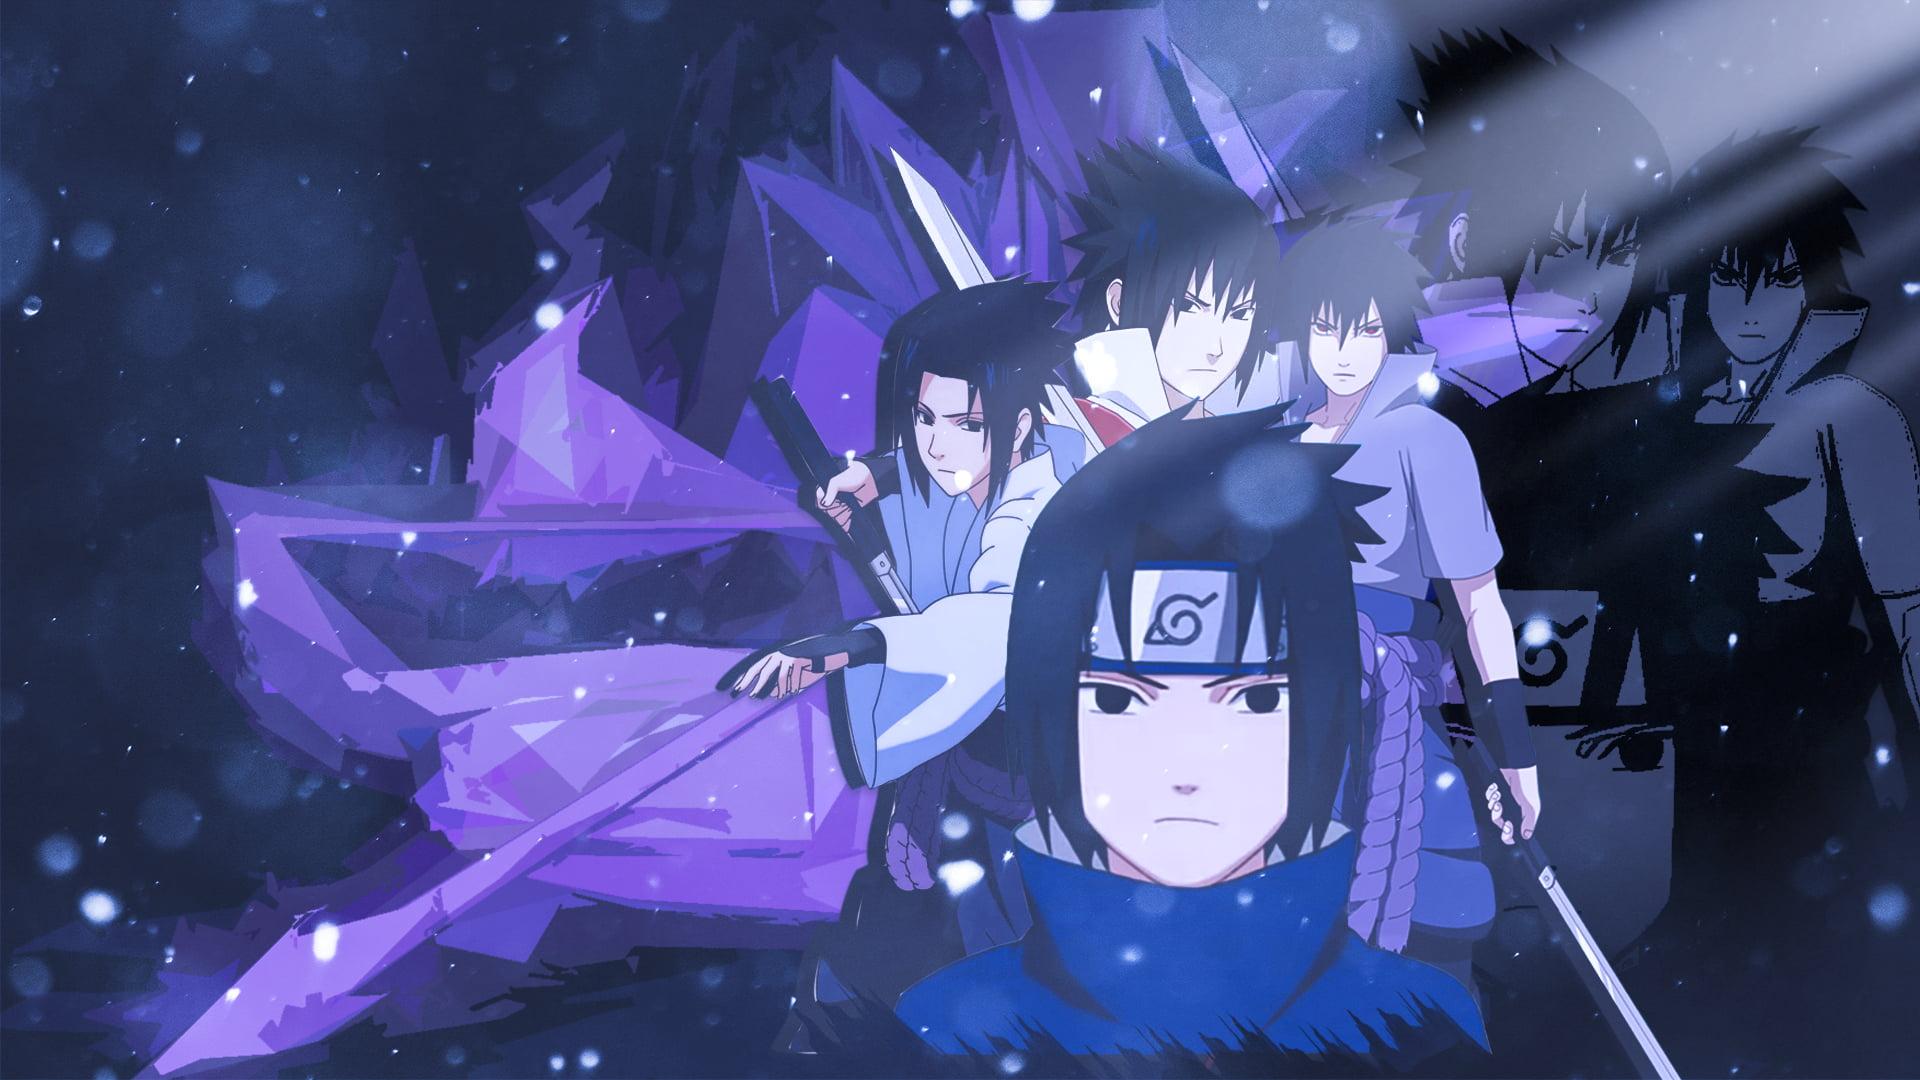 Anime Wallpaper Sasuke Uchiha Hd Wallpapers and backgrounds